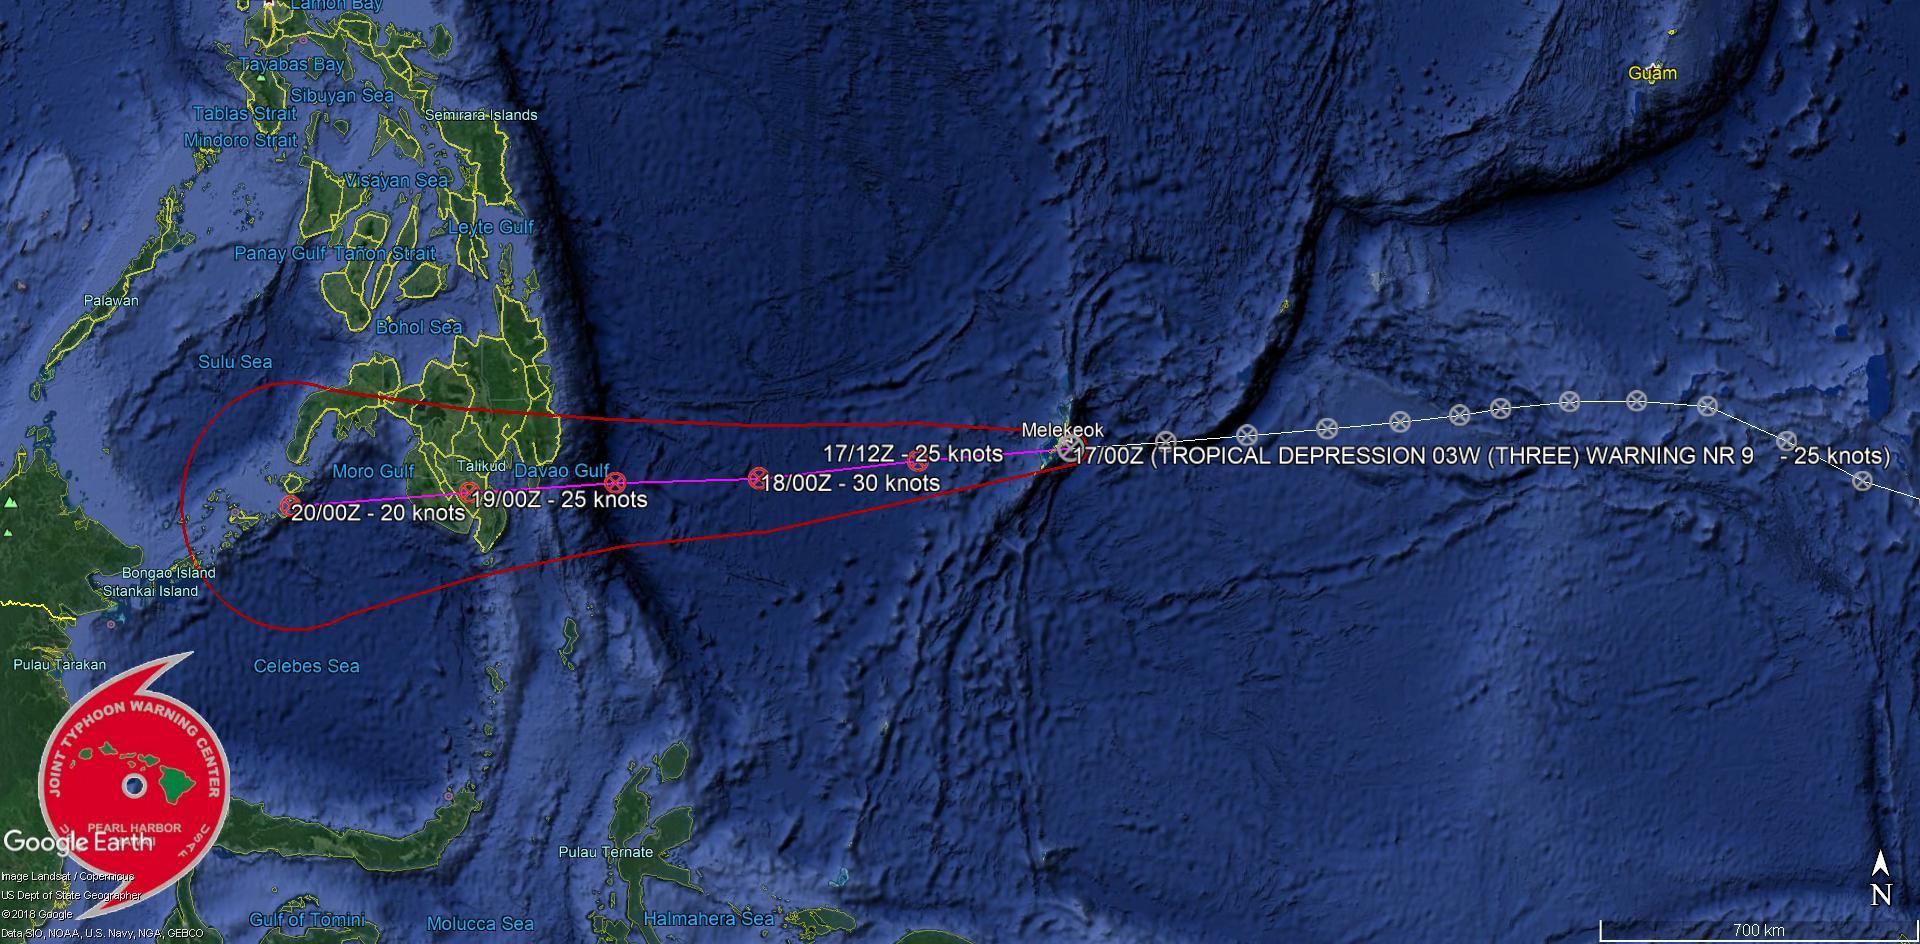 WARNING 9/JTWC